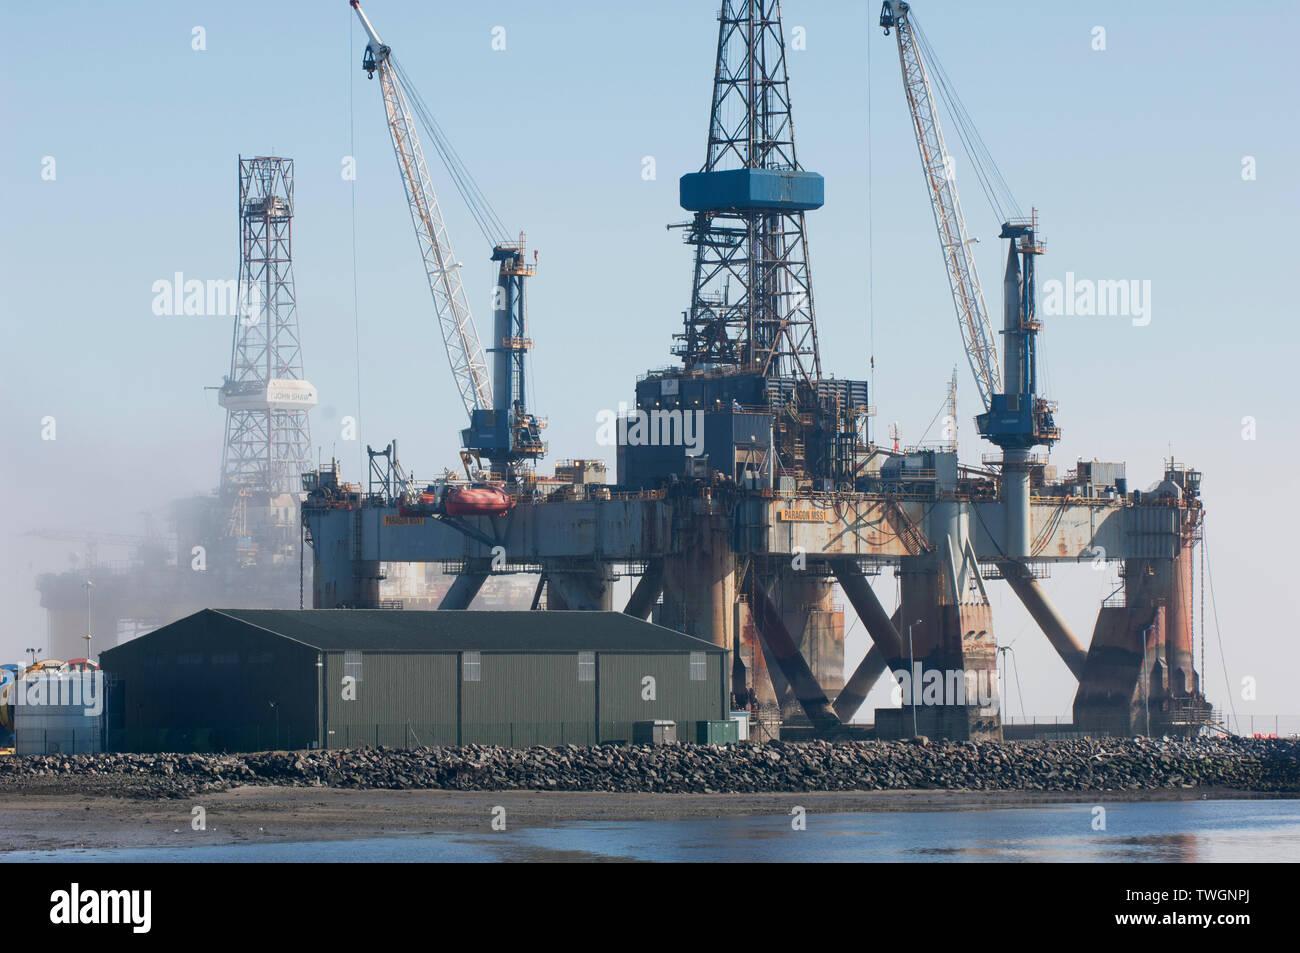 Oil rigs in the Cromarty Firth off Invergordon - Ross-shire, Scotland. - Stock Image